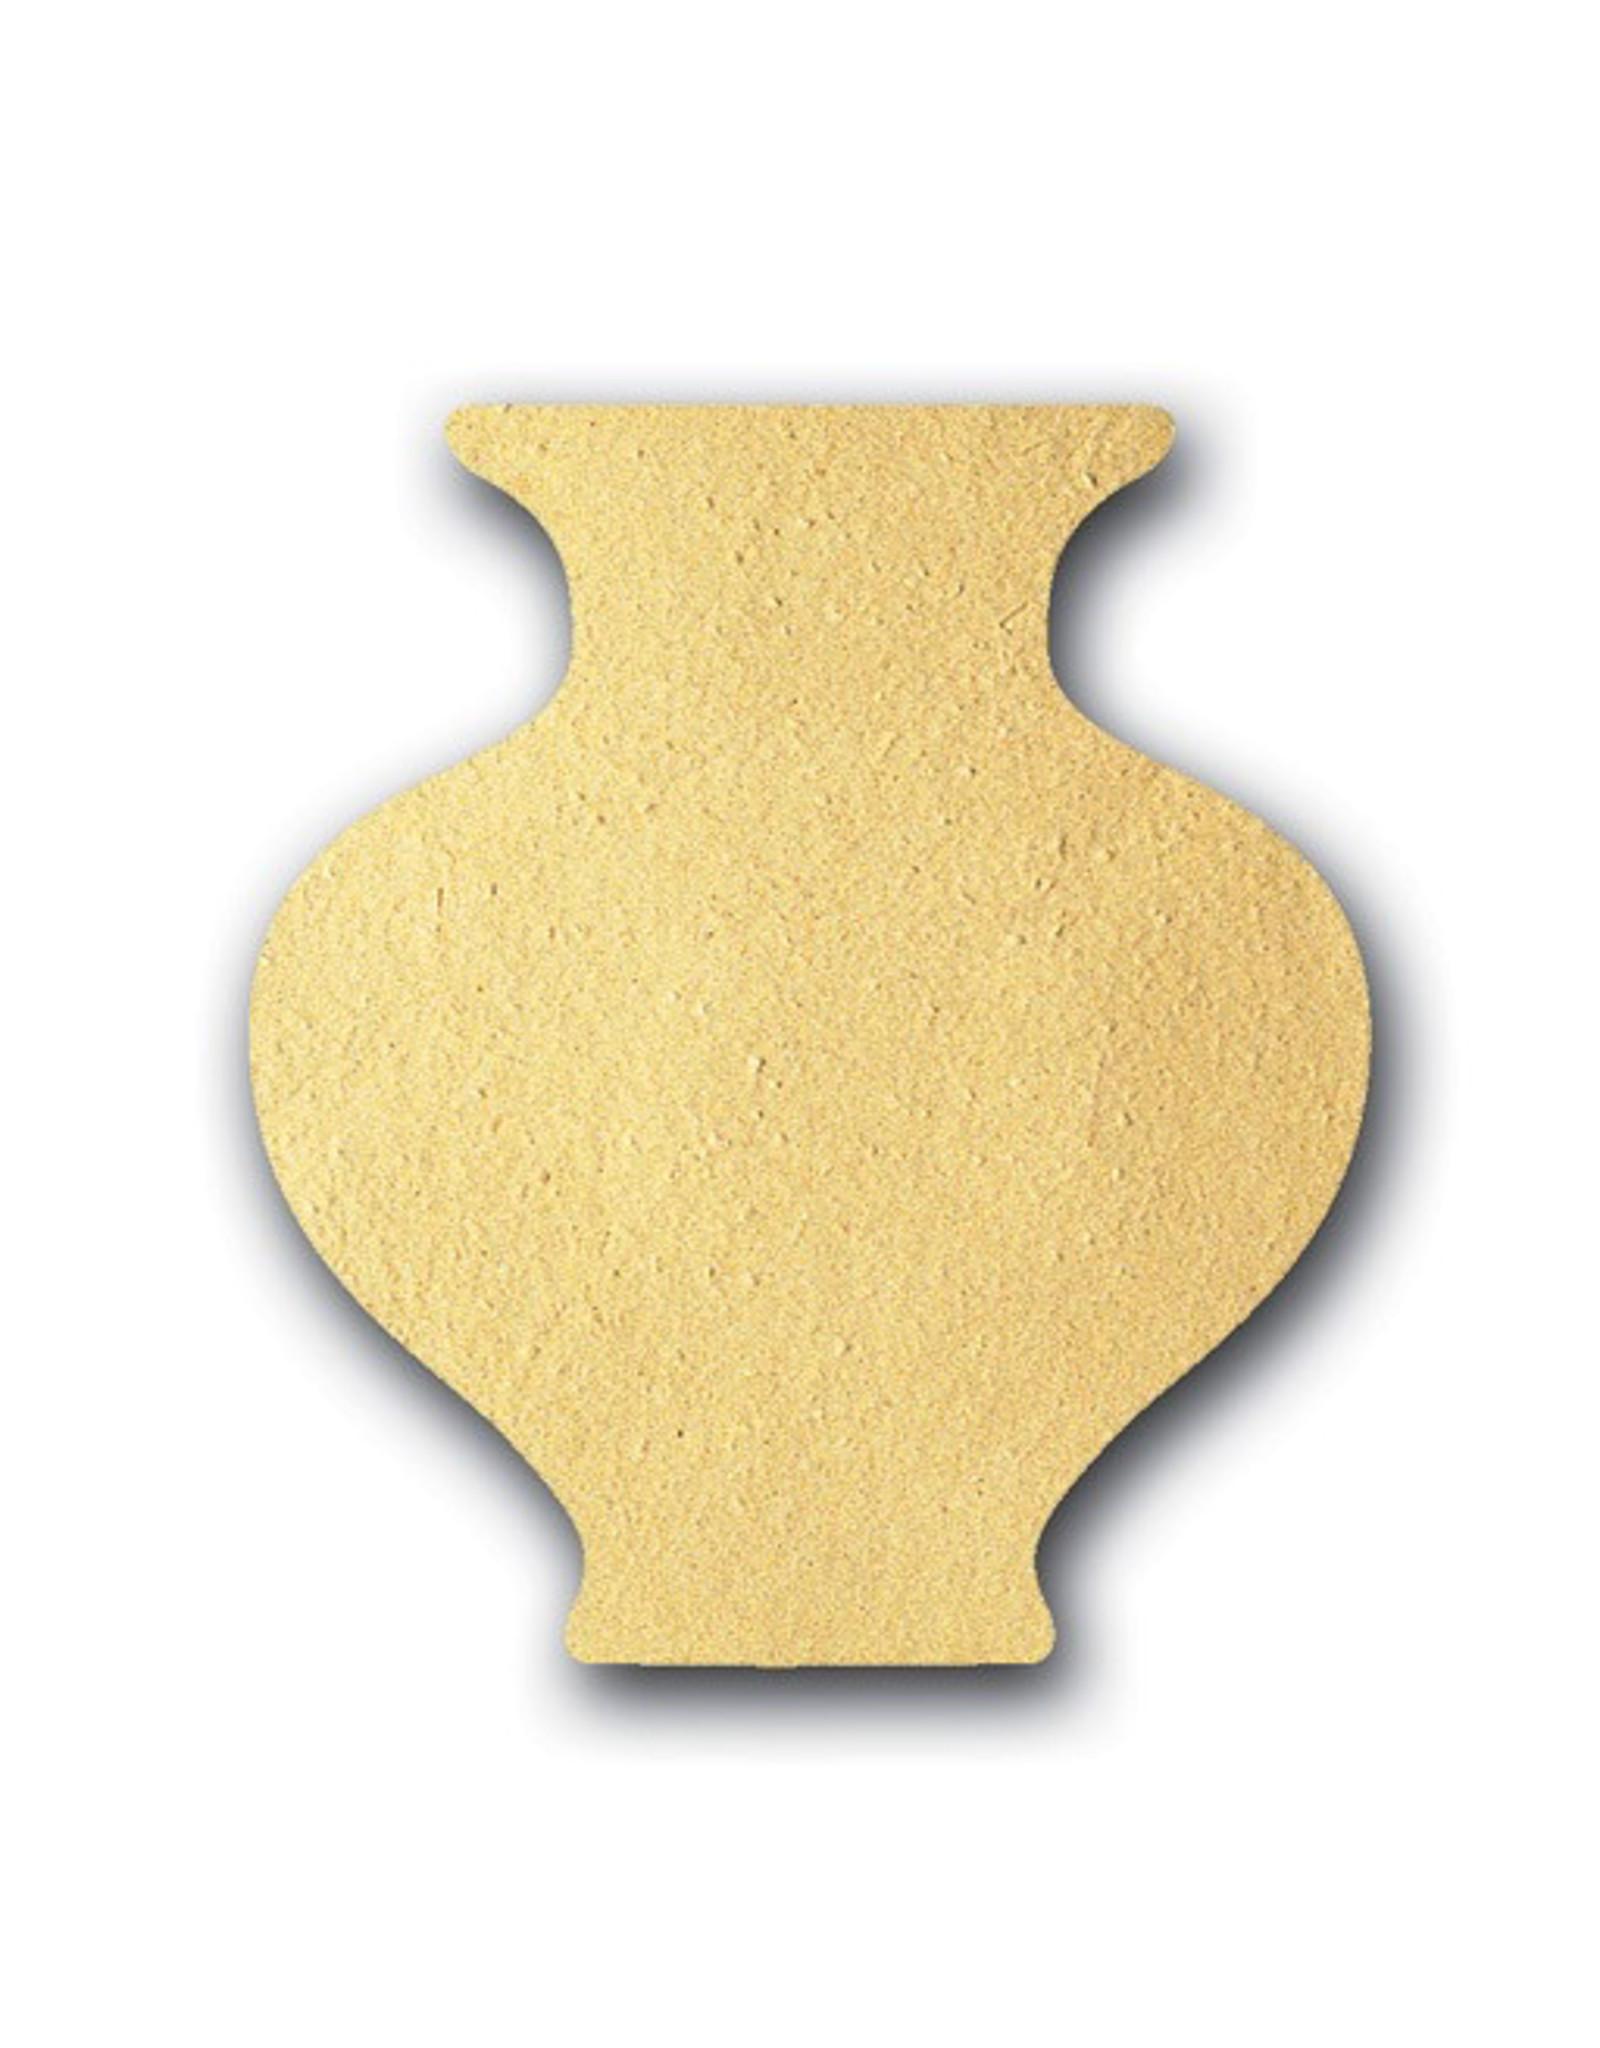 Scarva White Earthenware paper clay 1080°c - 1180°c 5kg